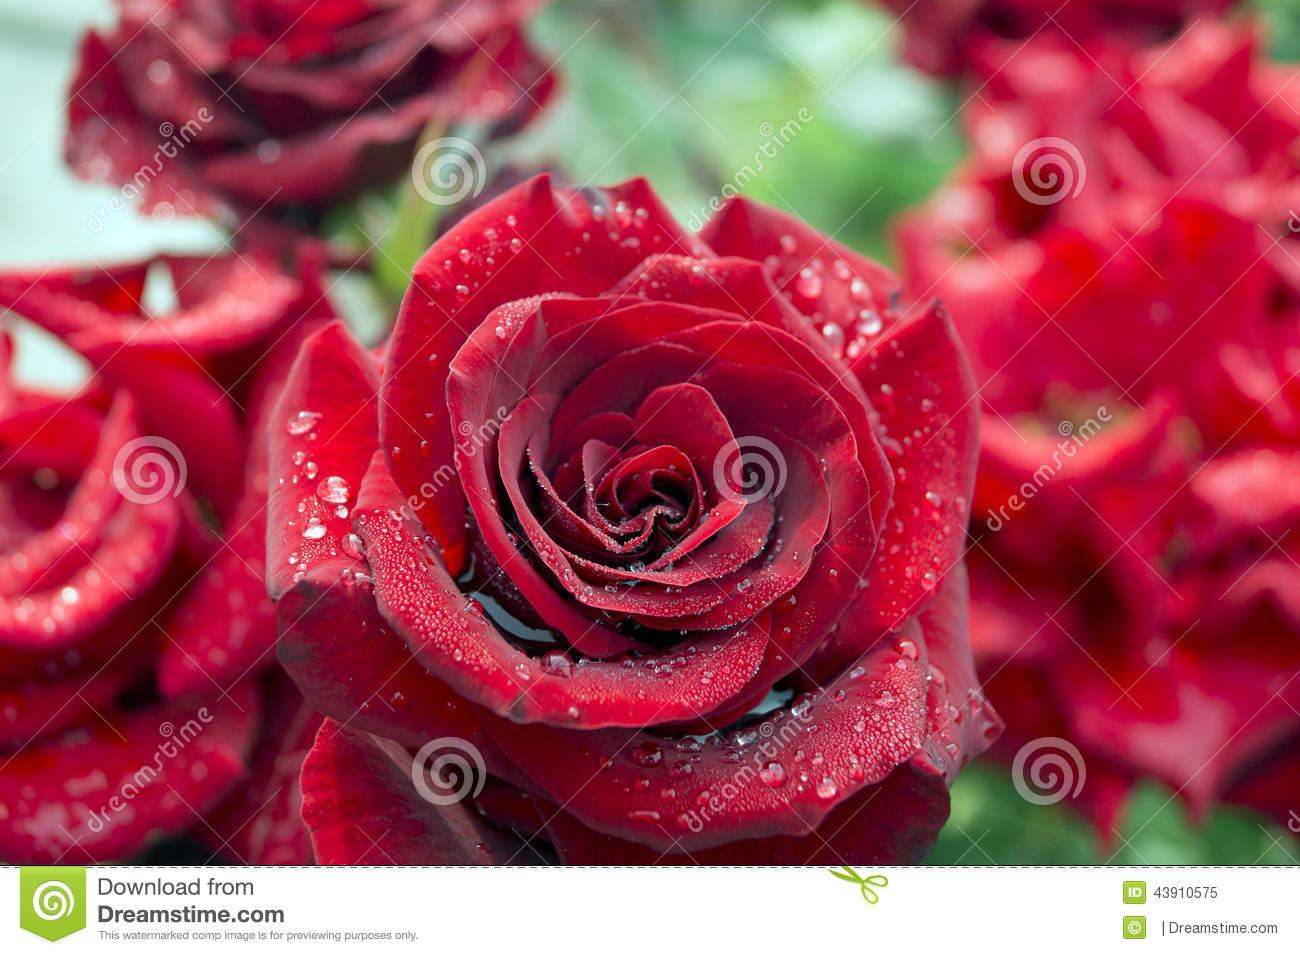 Raindrops On Rose Petals Stock Photo.